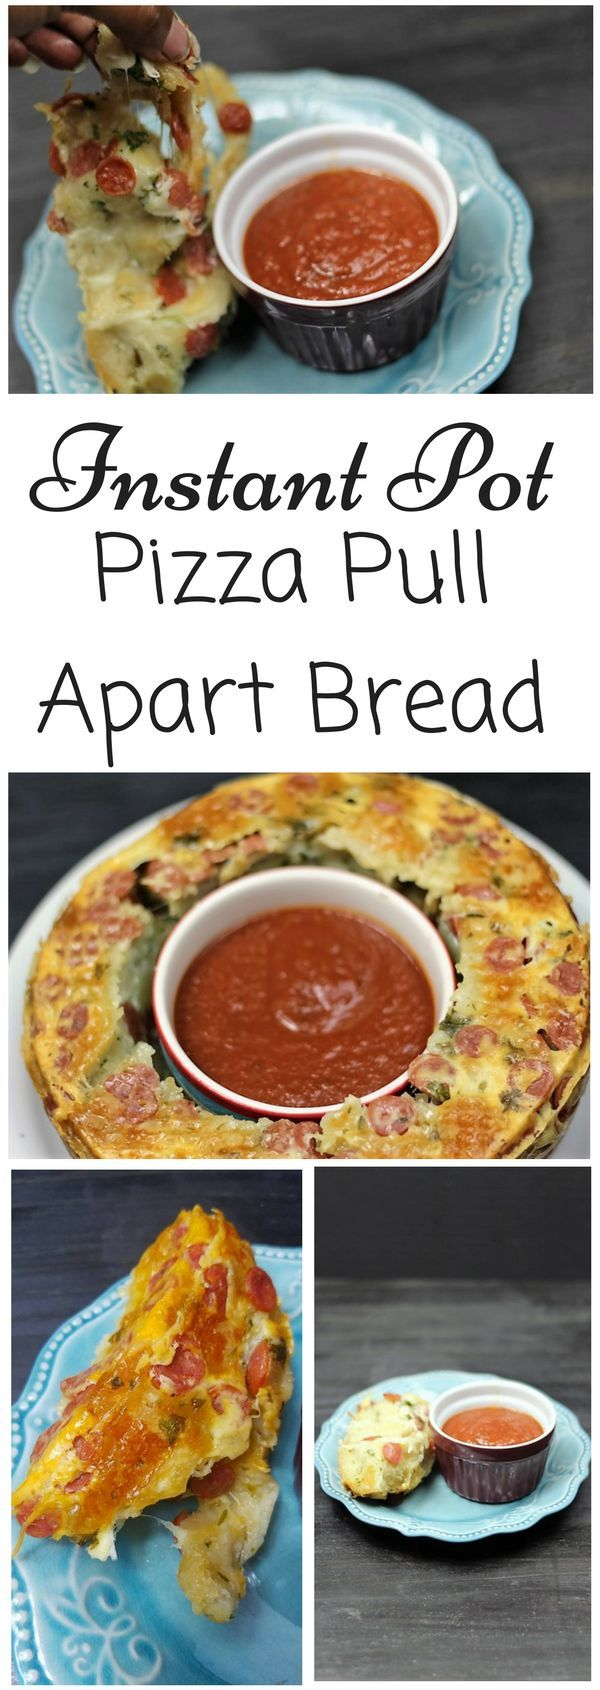 Instant Pot Pizza Pull Apart Bread